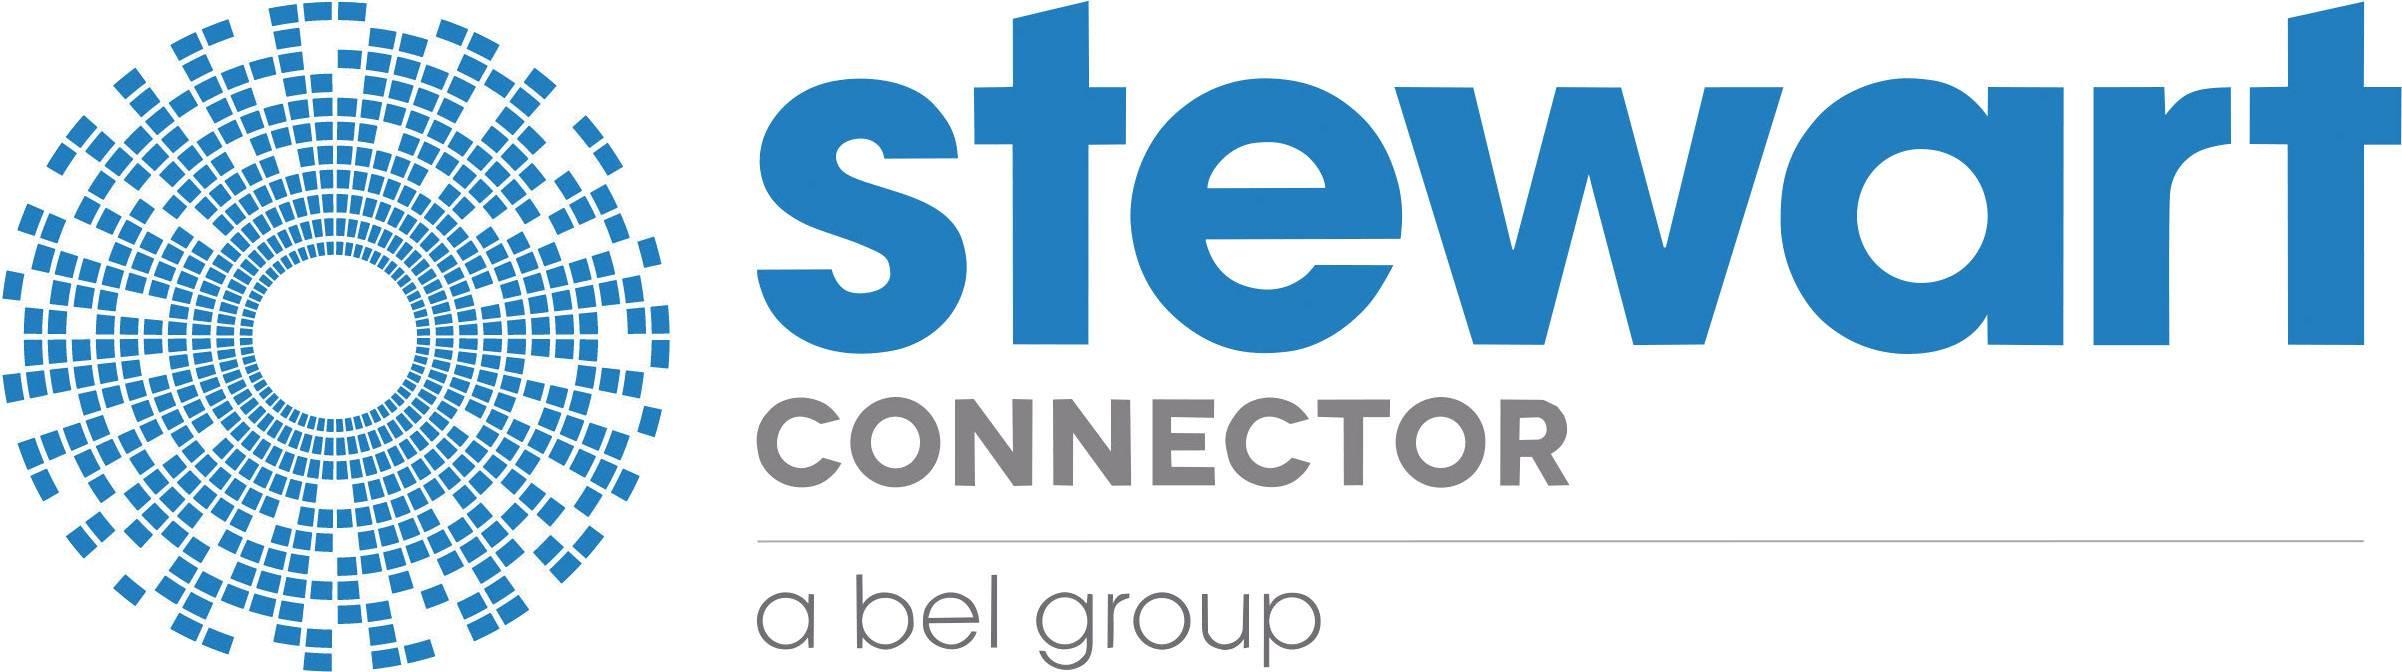 BEL Stewart Connectors